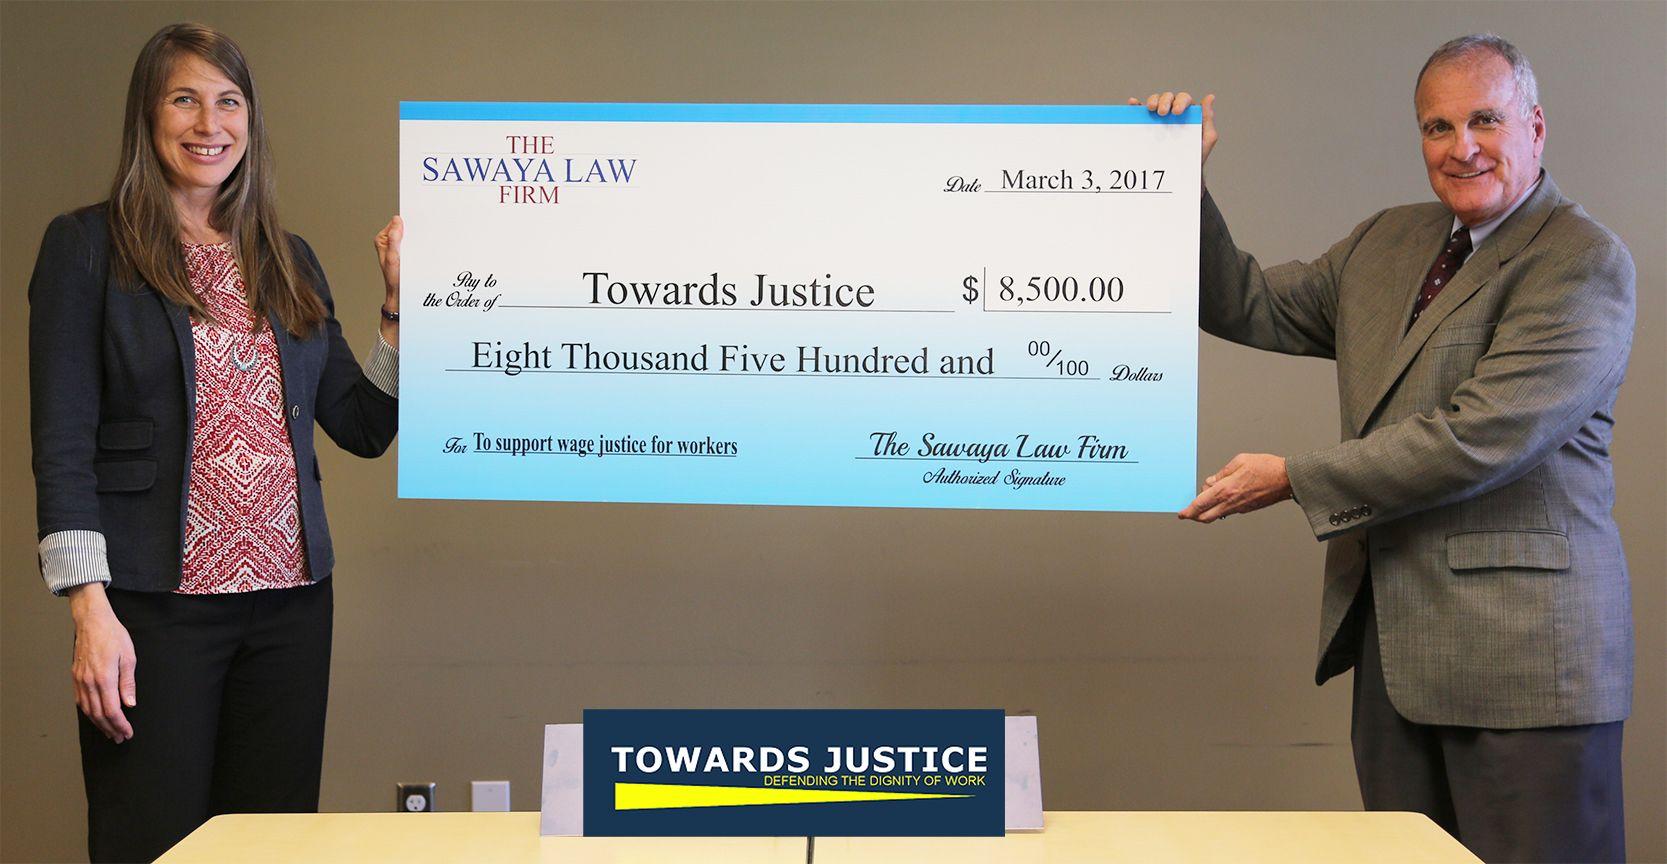 Sawaya Law Firm - Towards Justice